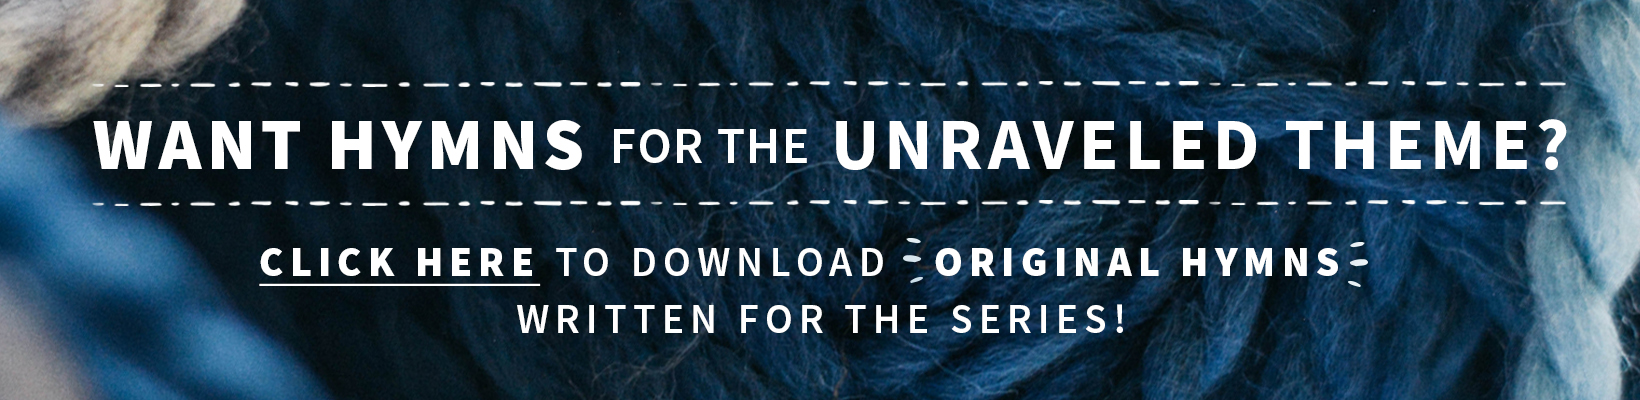 unraveled_hymn_banner.jpg